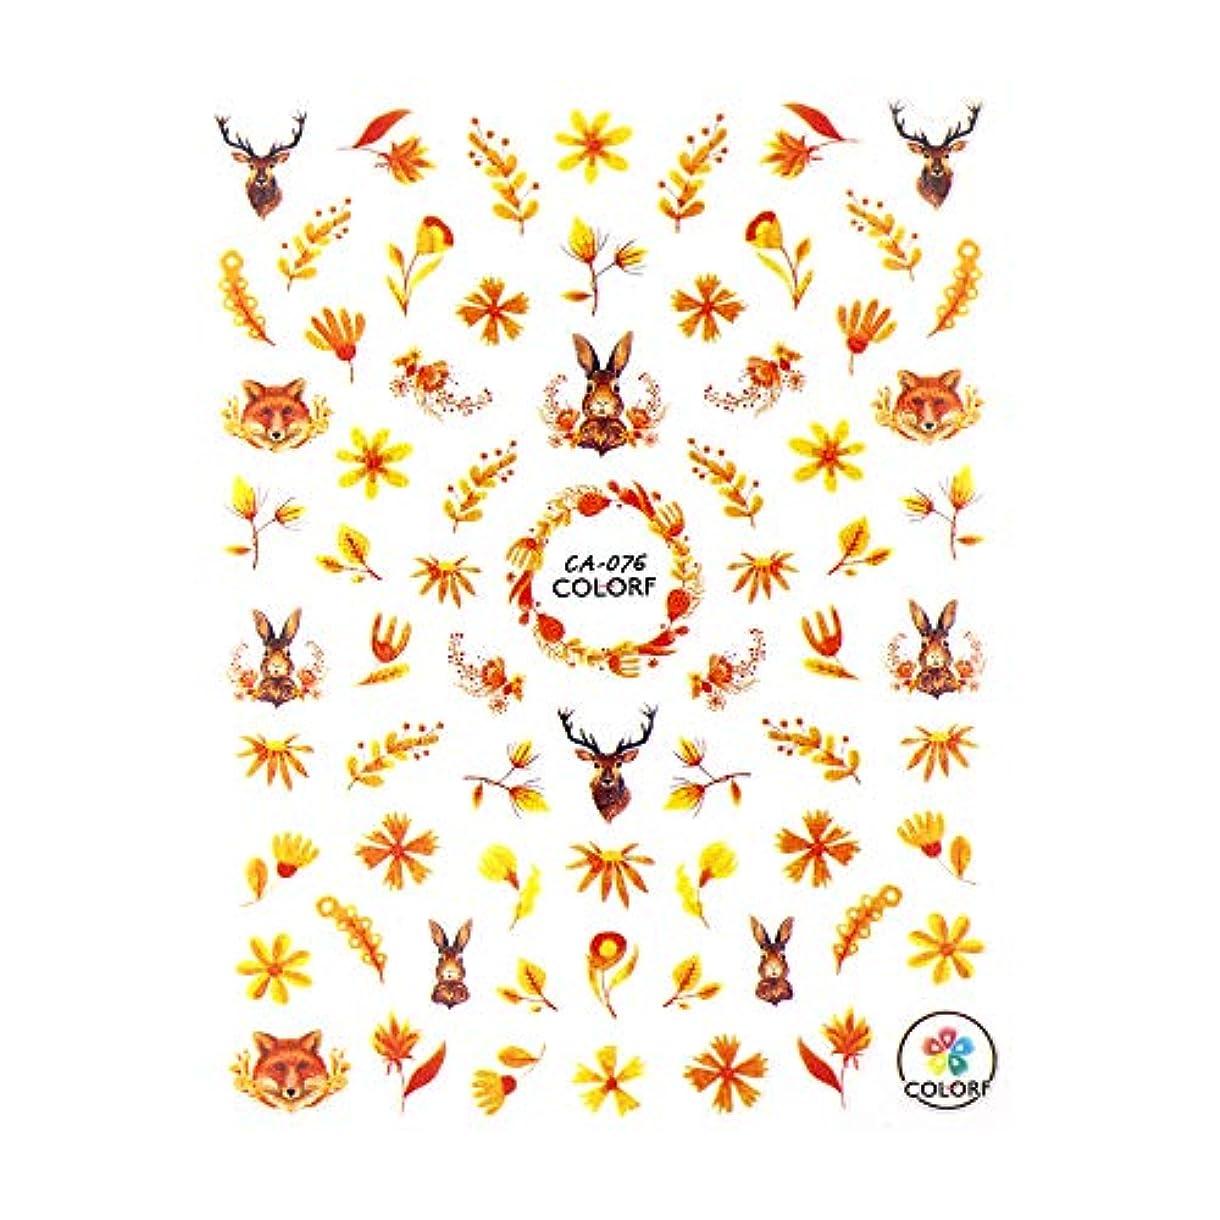 irogel イロジェル ネイルシール ネイルシール オータムリーフシール 【CA-076 タイプA】秋ネイル 花柄 紅葉 落ち葉